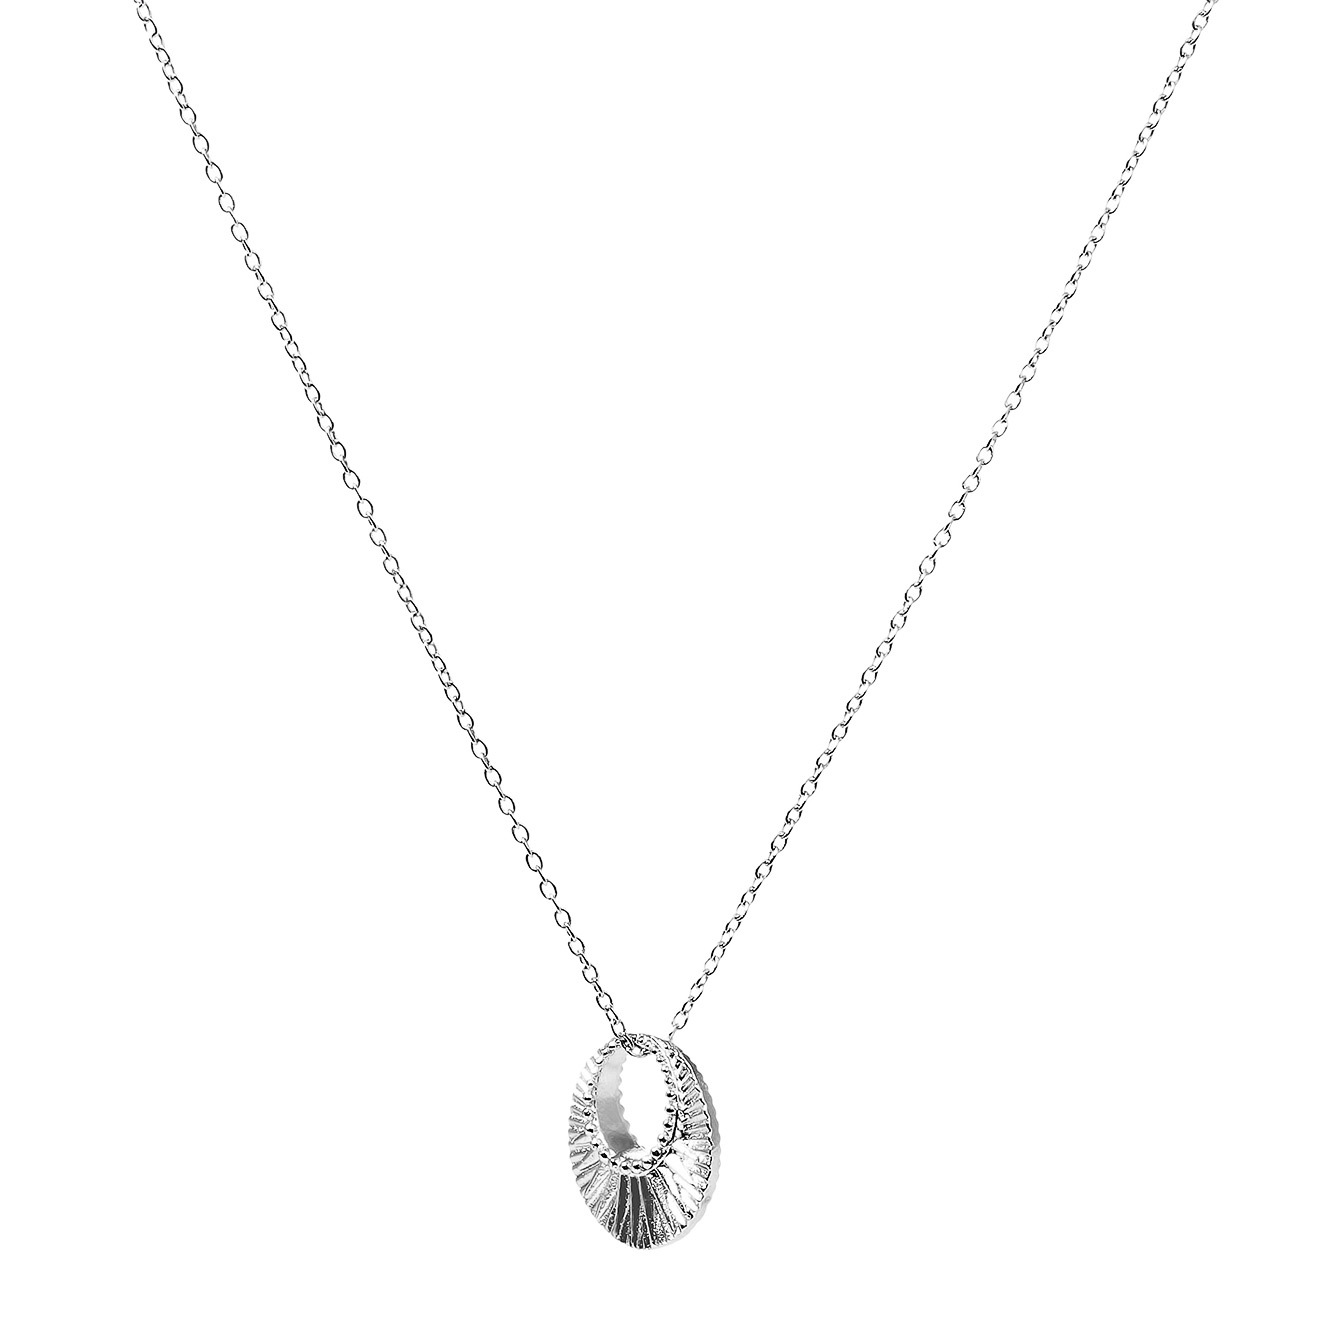 Mya Bay Покрытое серебром колье Celeste